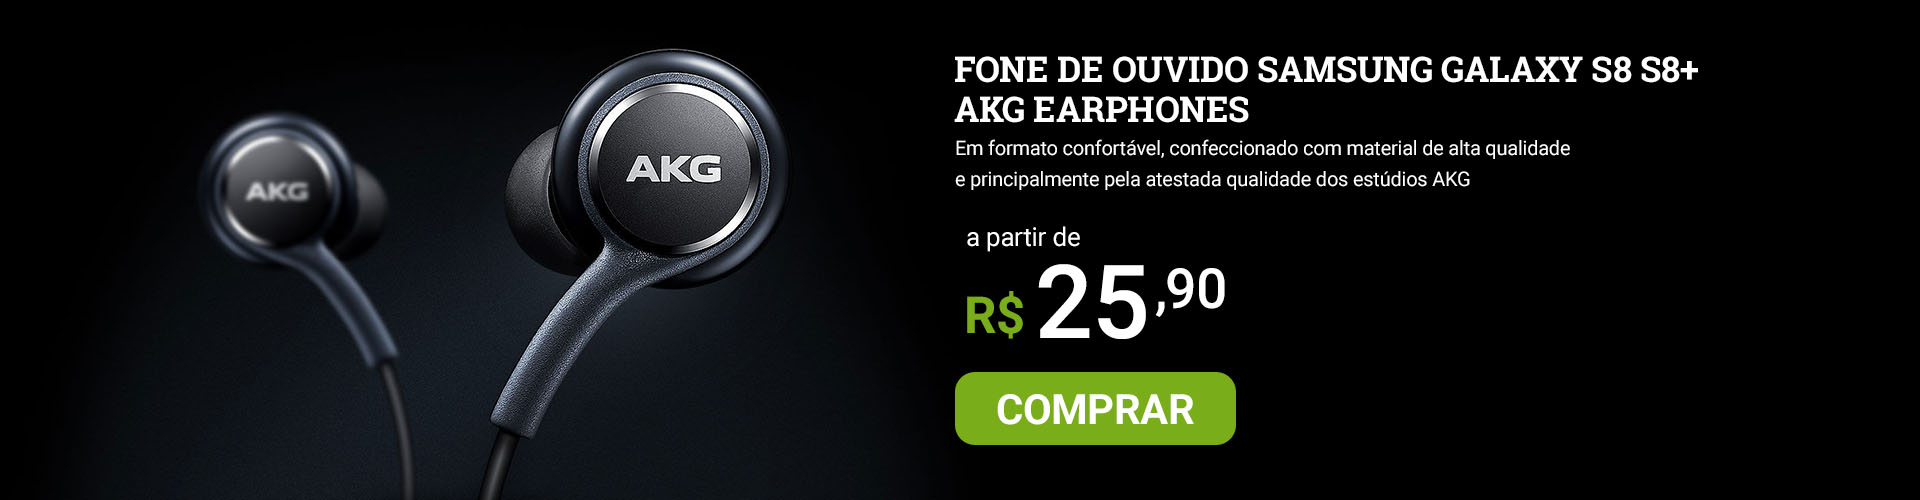 superoff - fone de ouvido akg earphones samsung